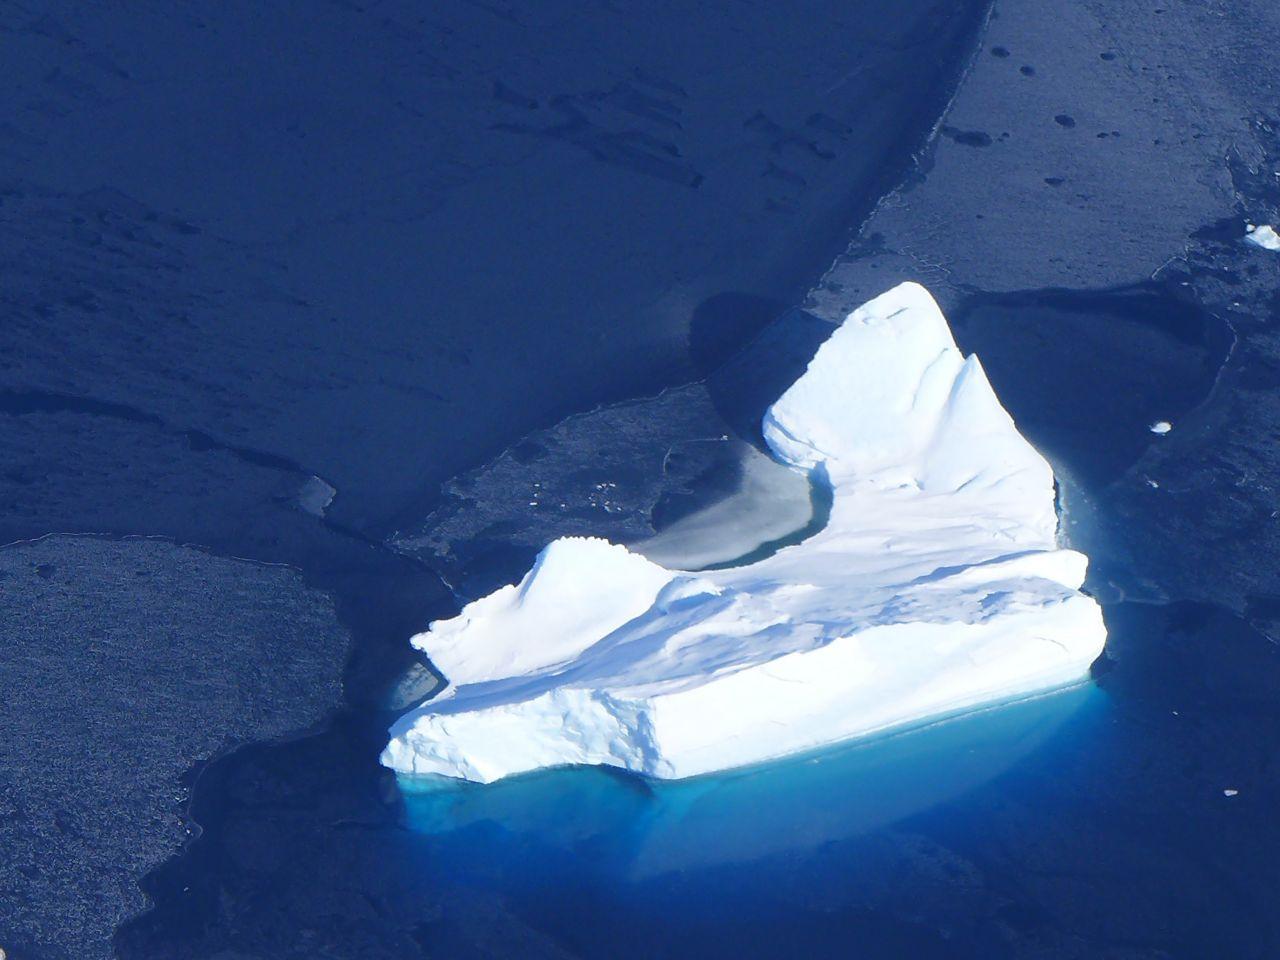 Eisbergwarnung